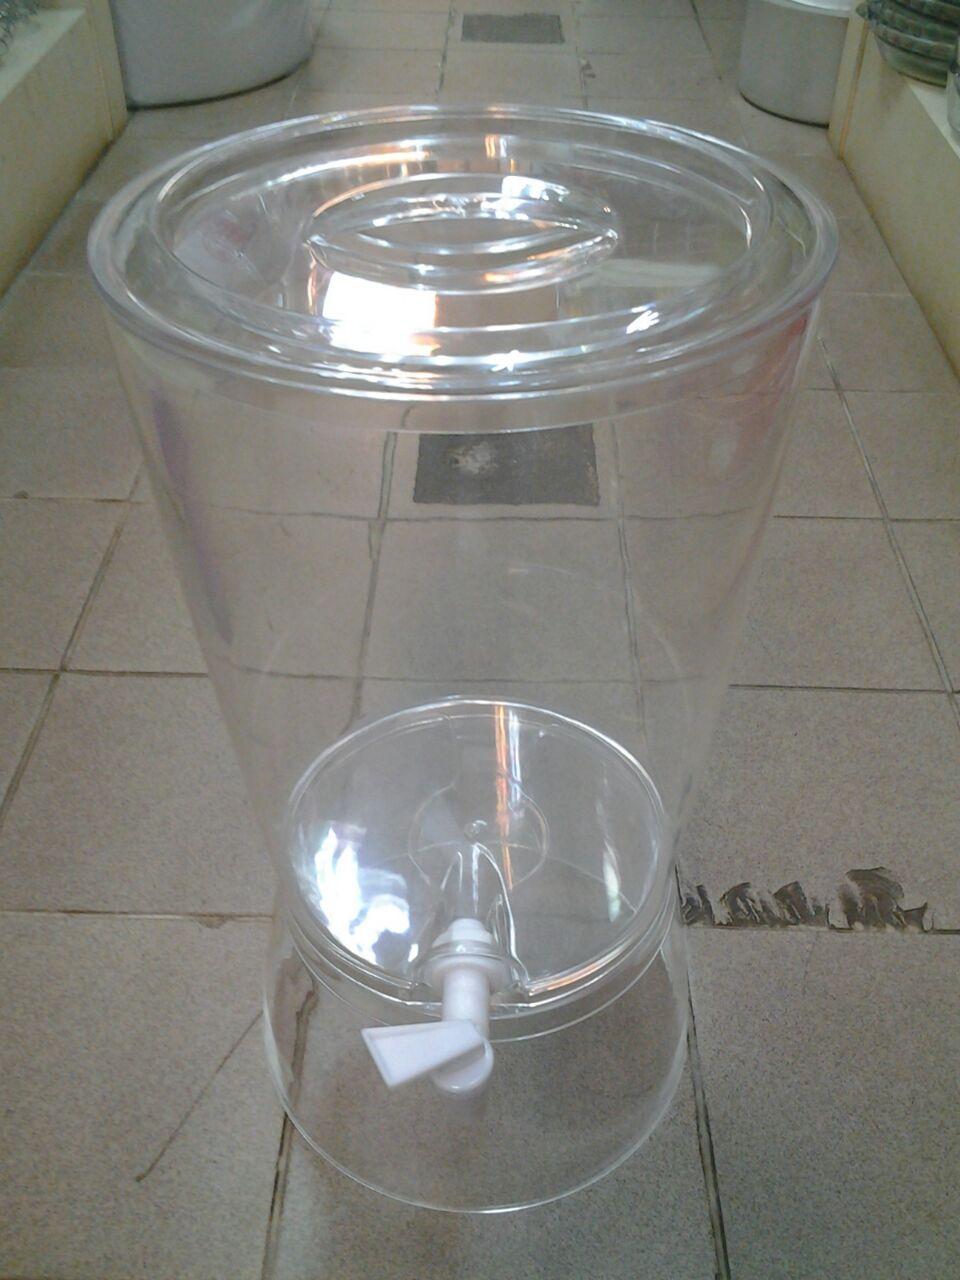 Bekas Air Bertingkat Untuk majlis makan makan kenduri